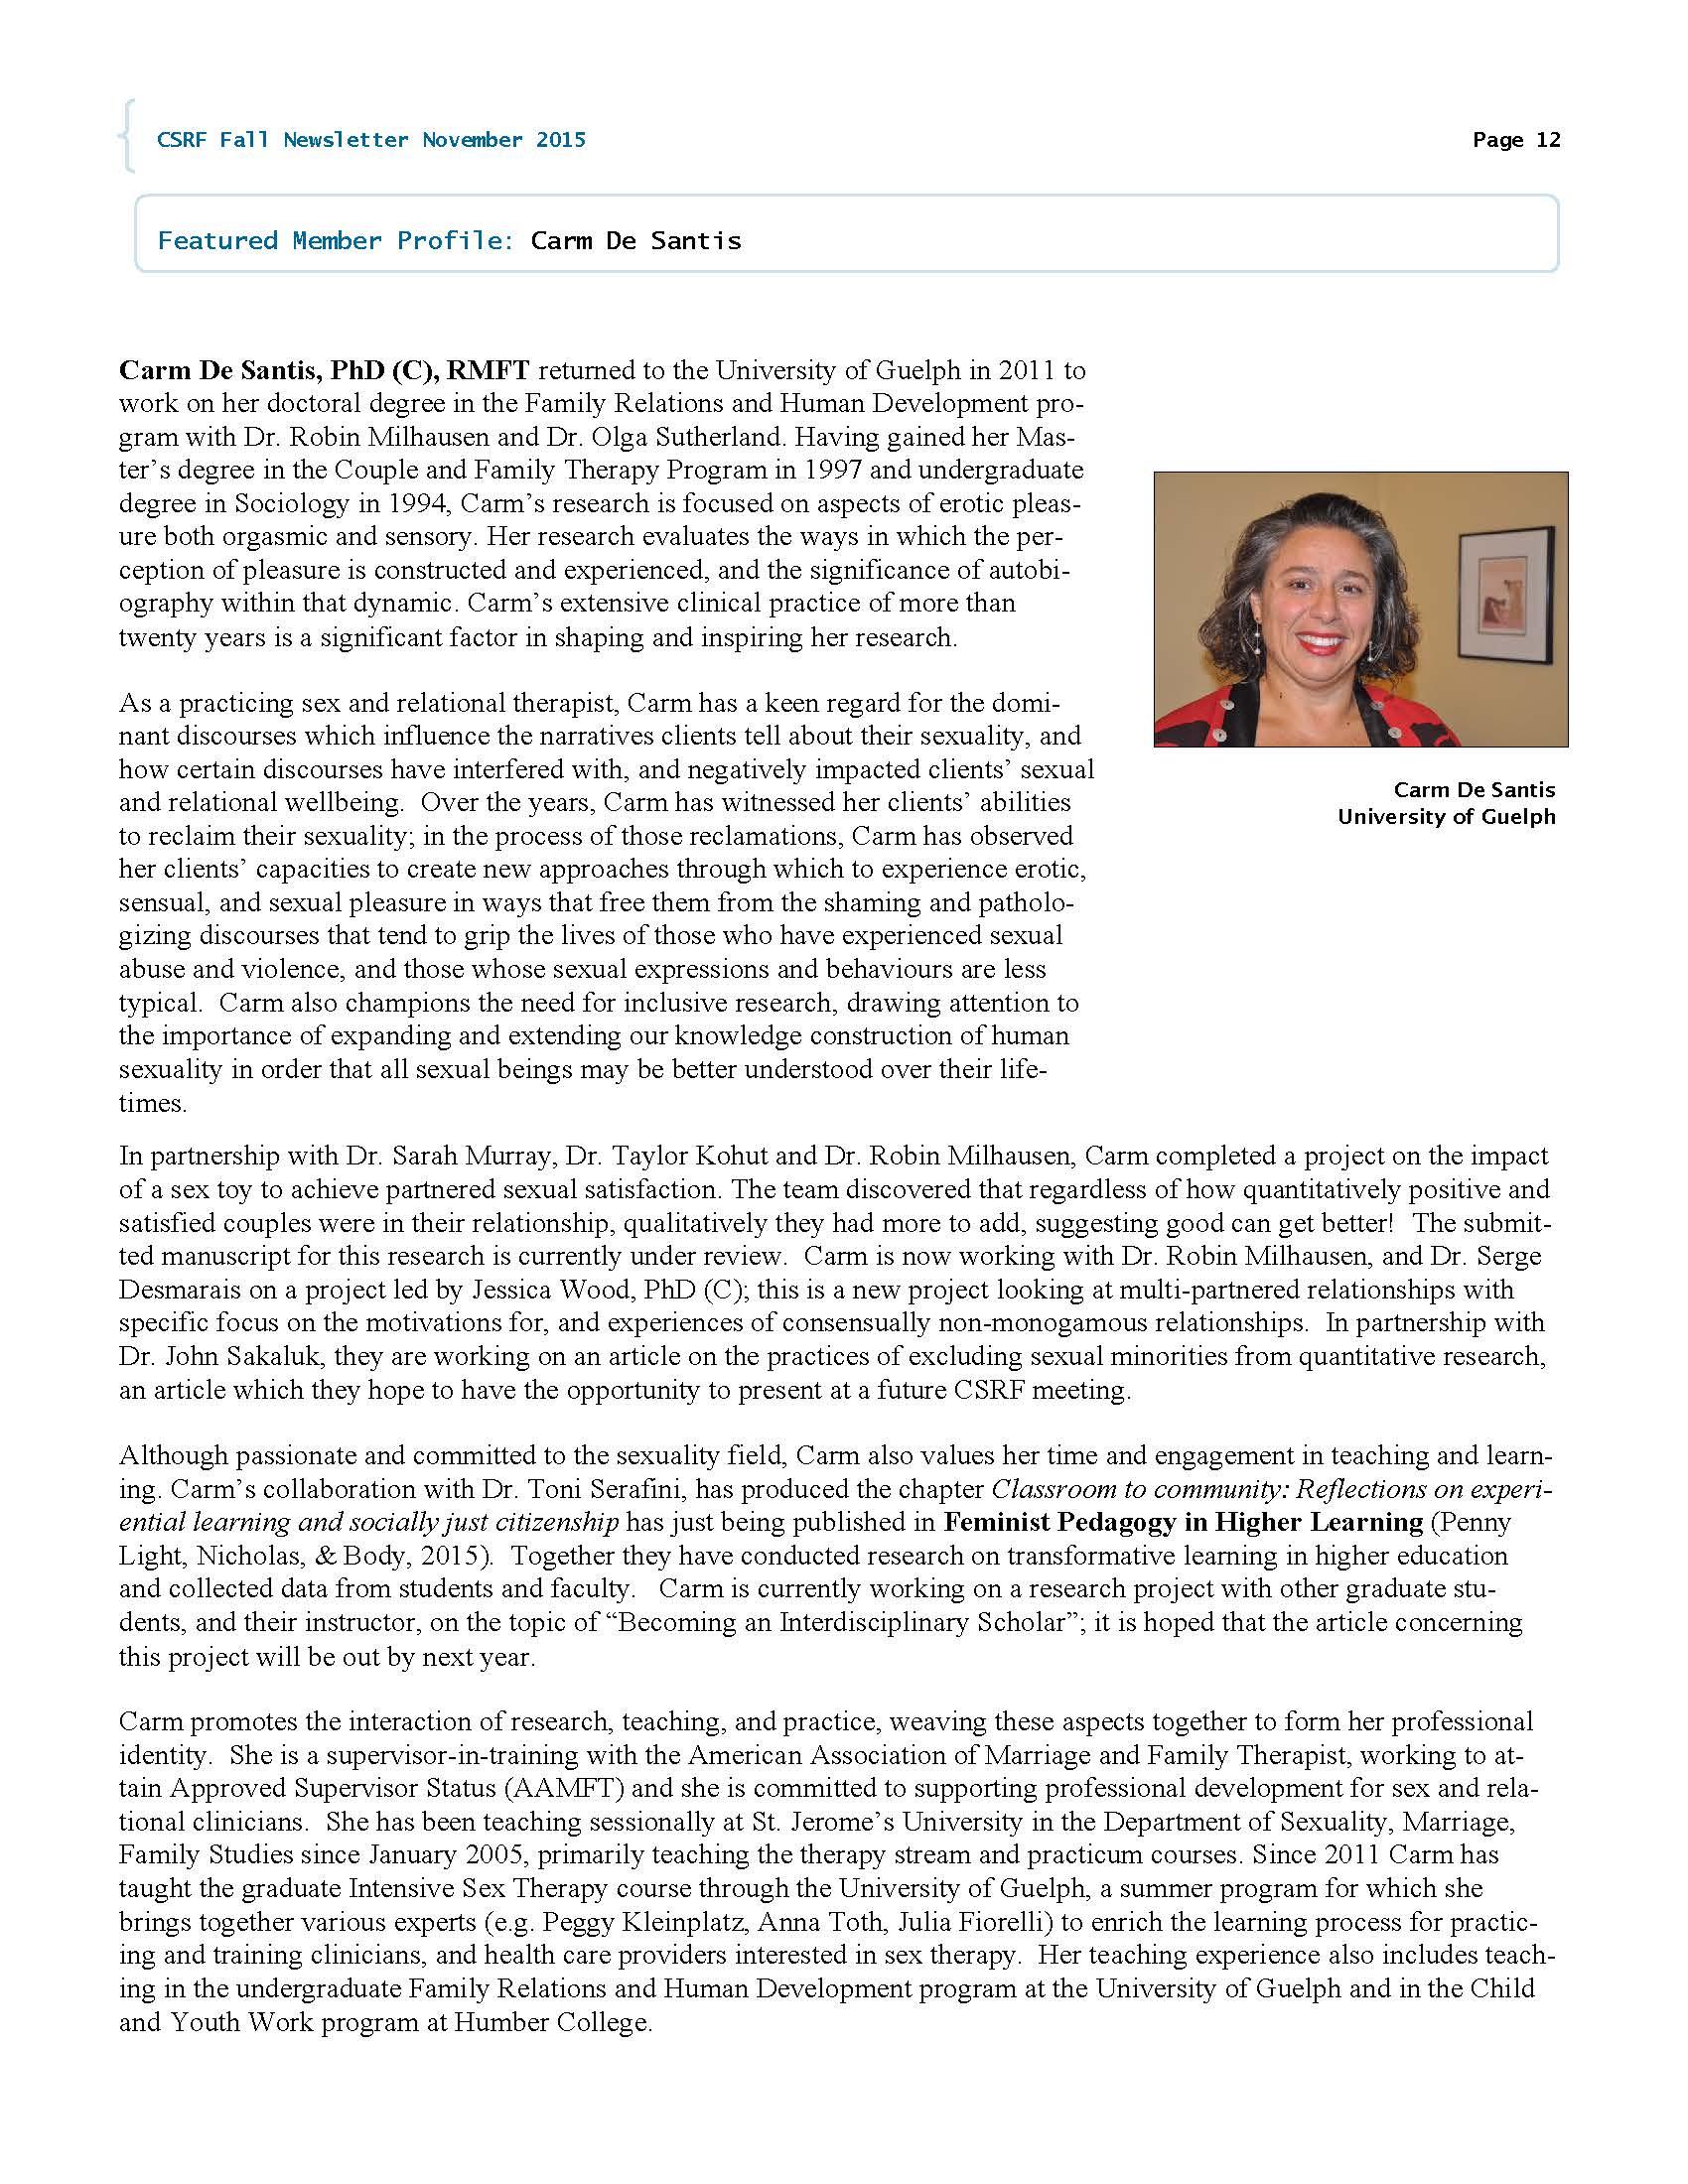 CSRF Fall Newsletter 2015_Page_12.jpg